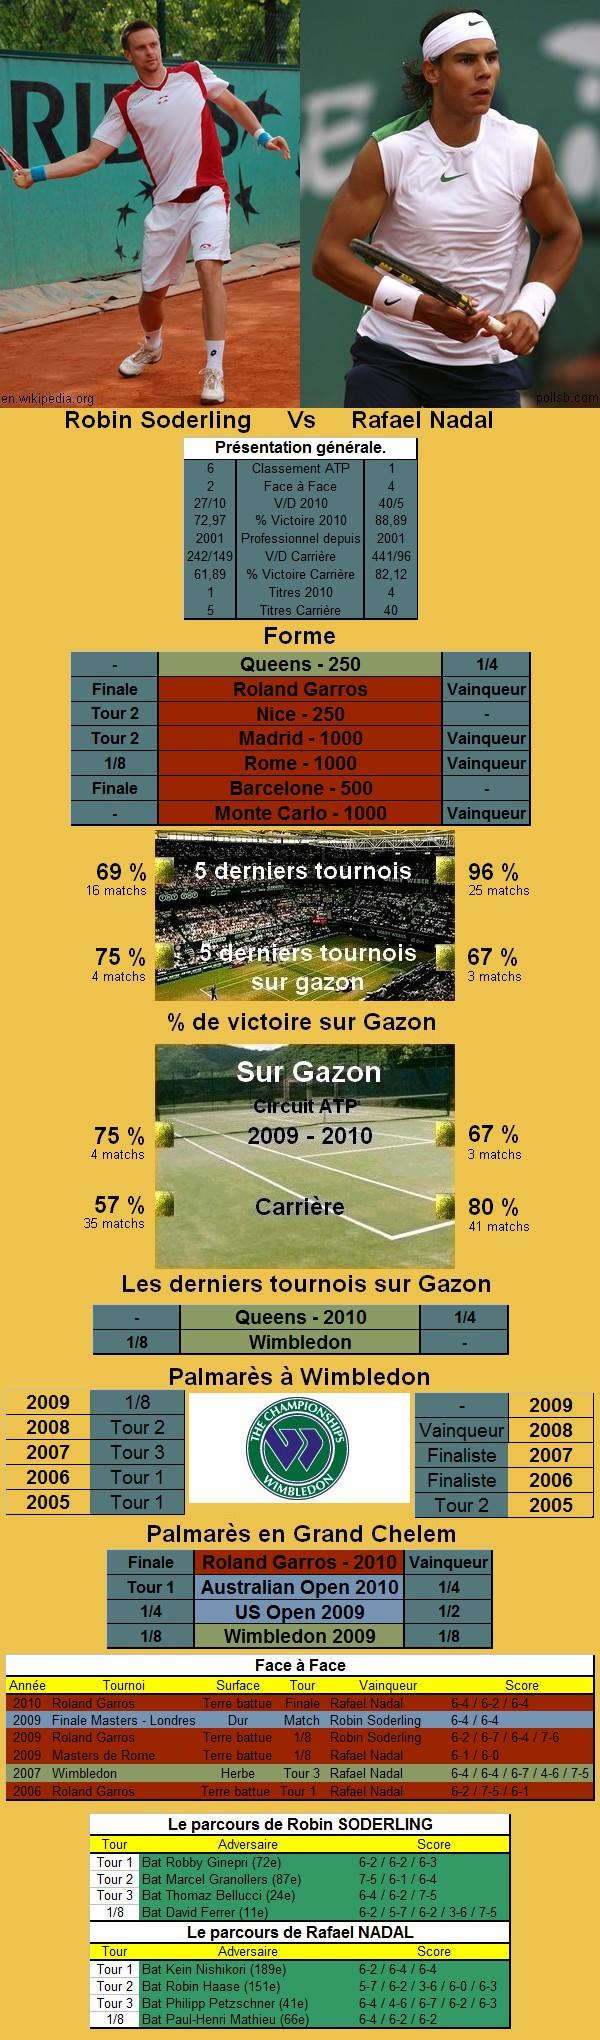 Statistiques tennis de Soderling contre Nadal à Wimbledon